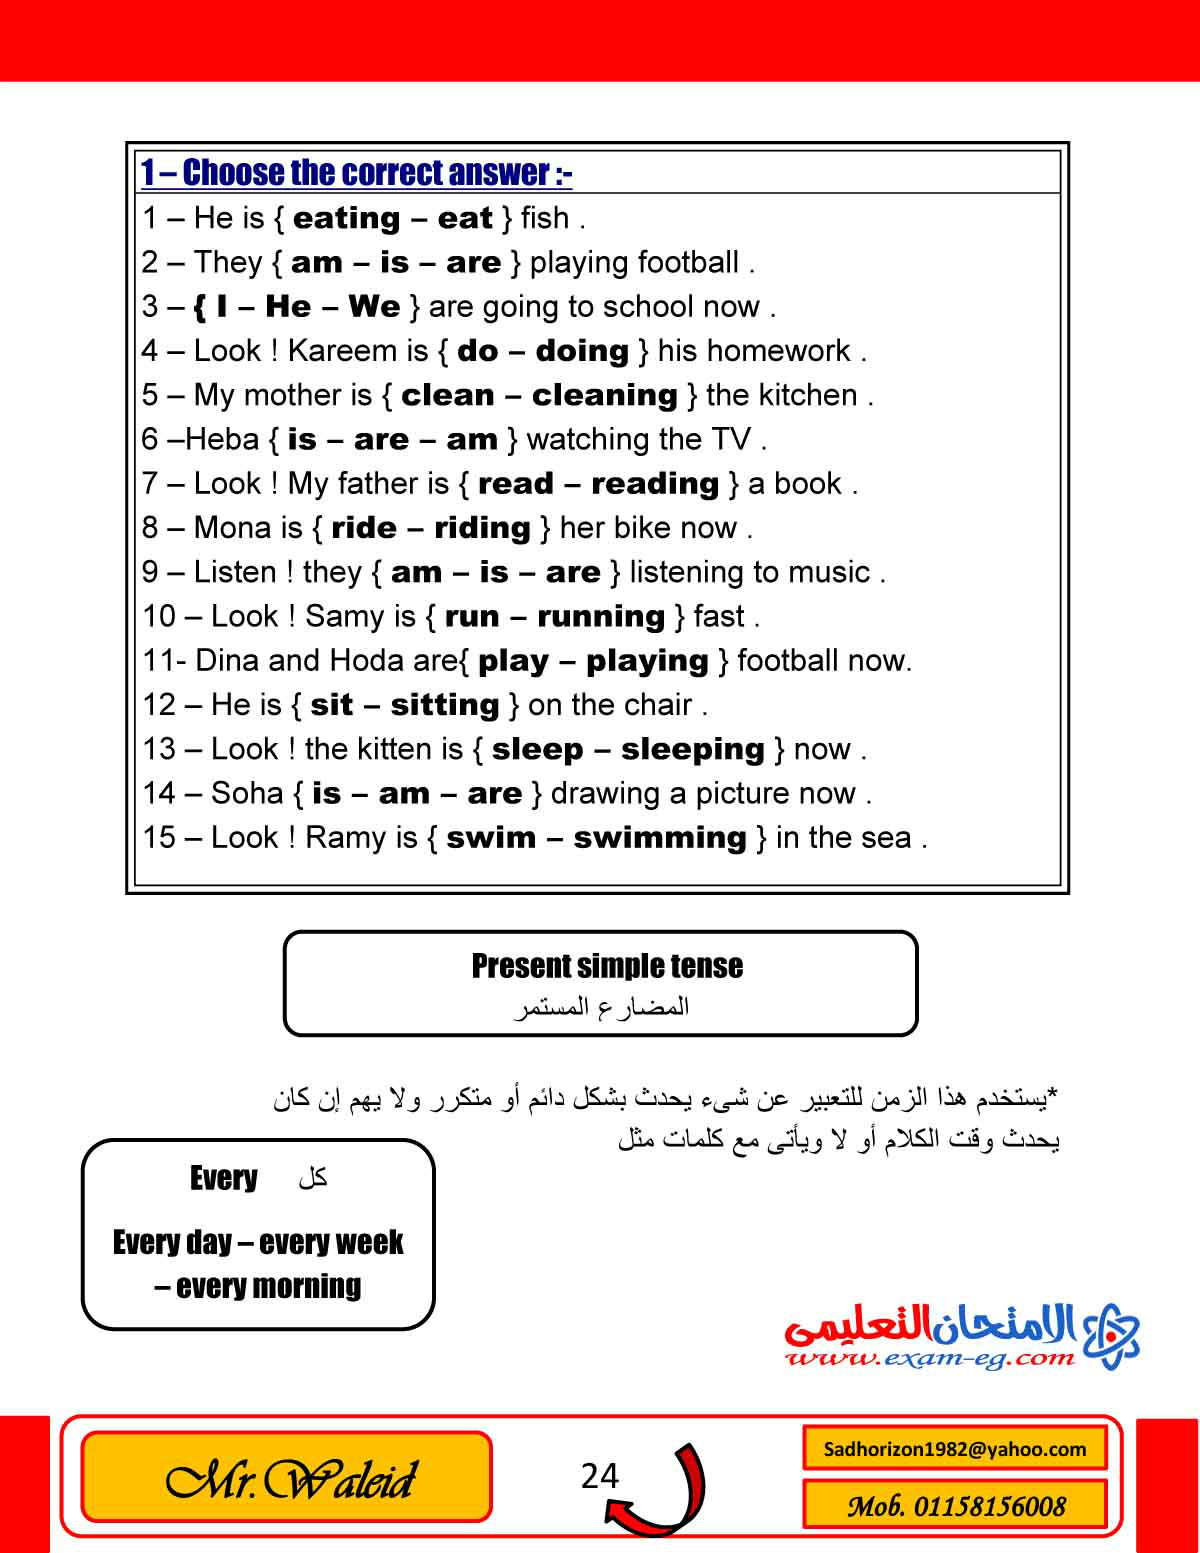 exam-eg.com_1449405428634.jpg